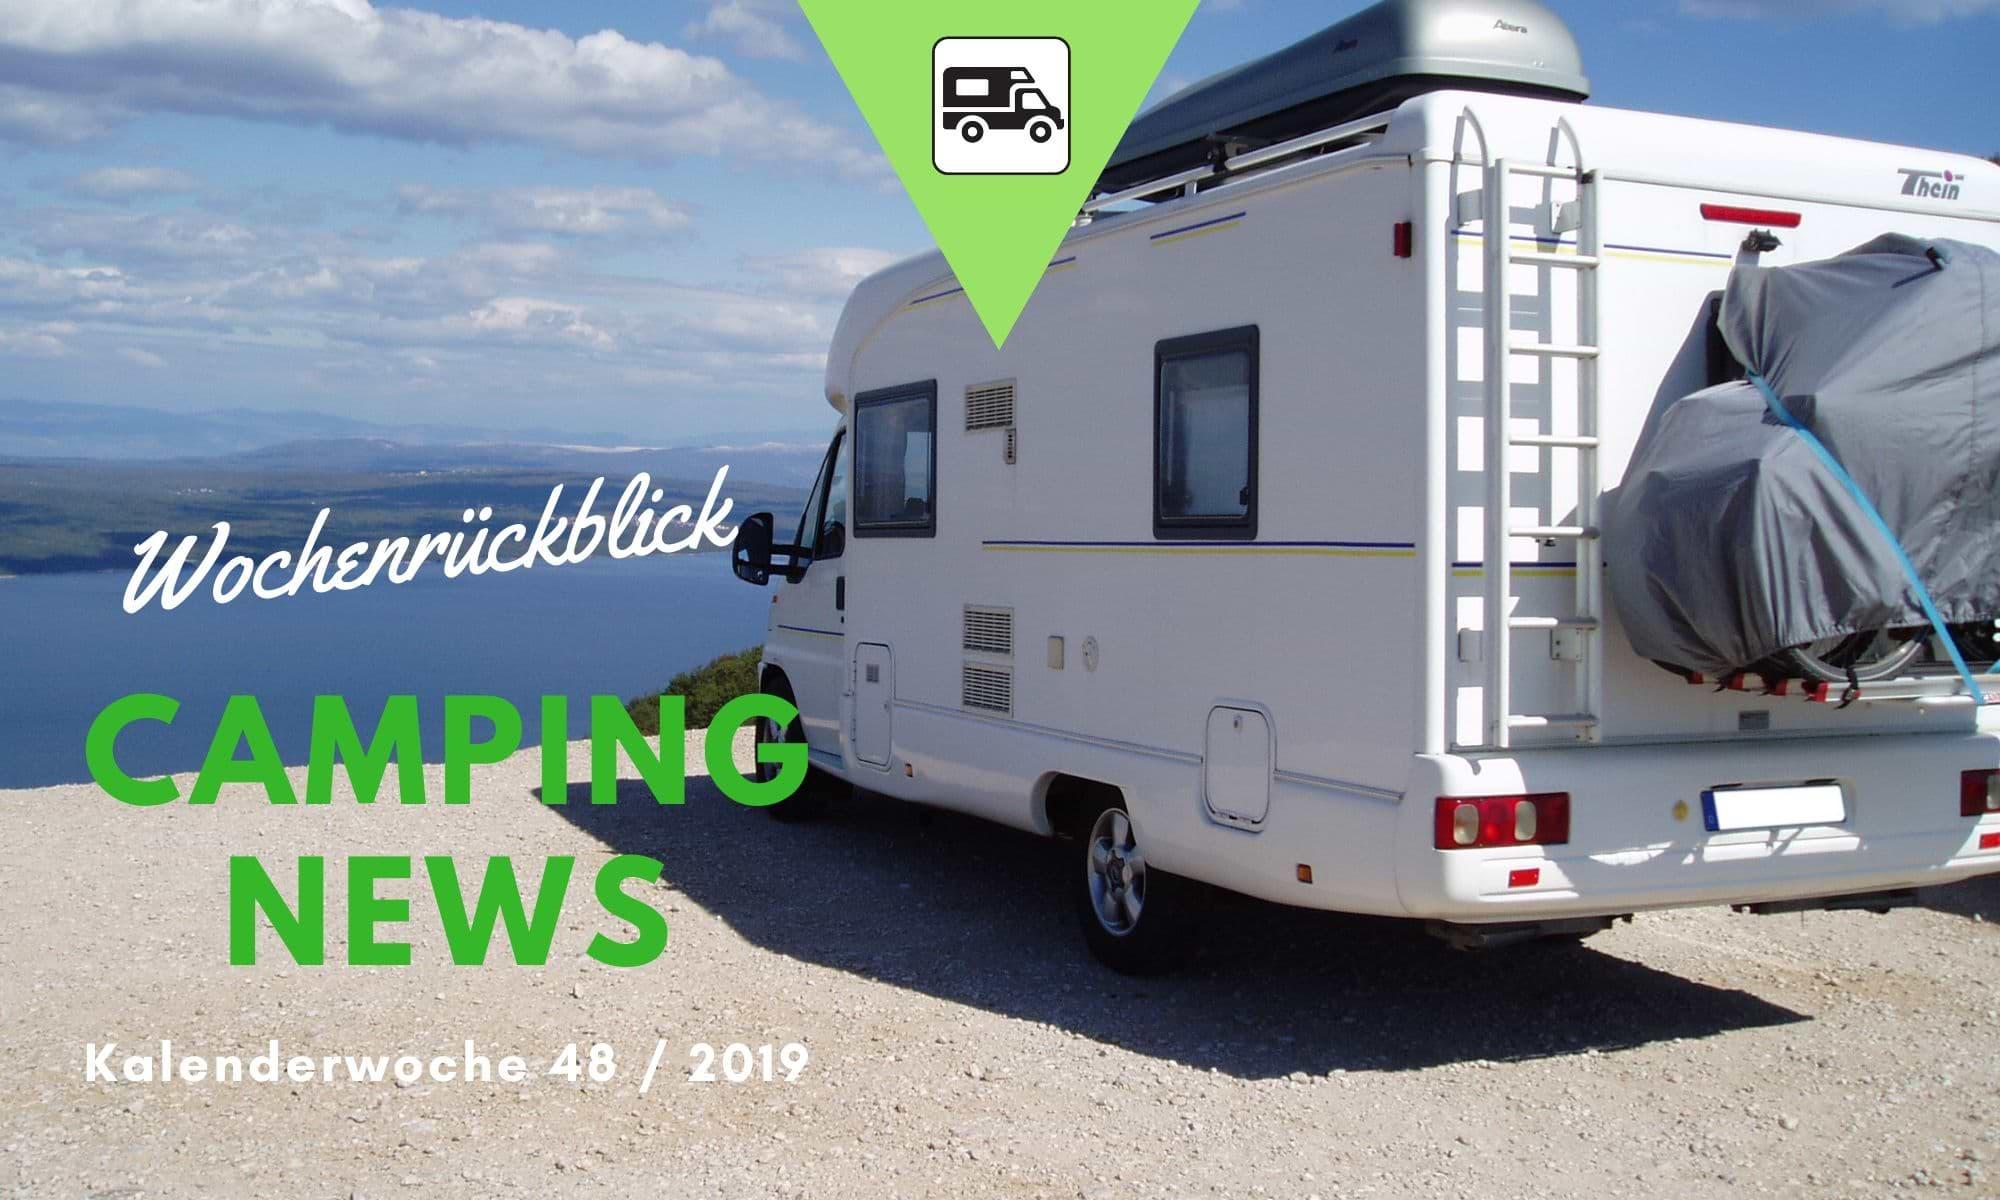 Wochenrückblick Camping News KW48-2019